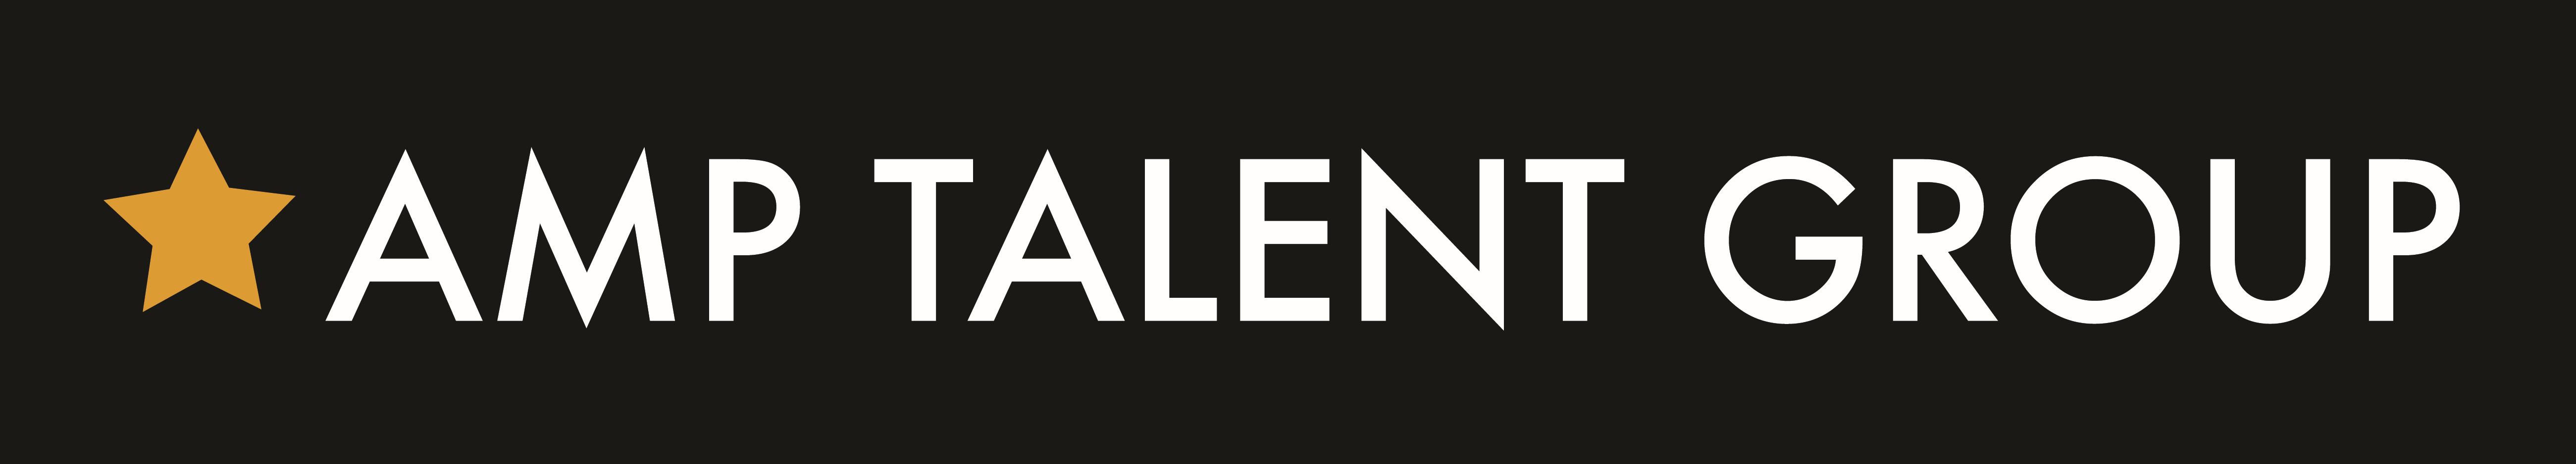 AMP Talent Group Inc company